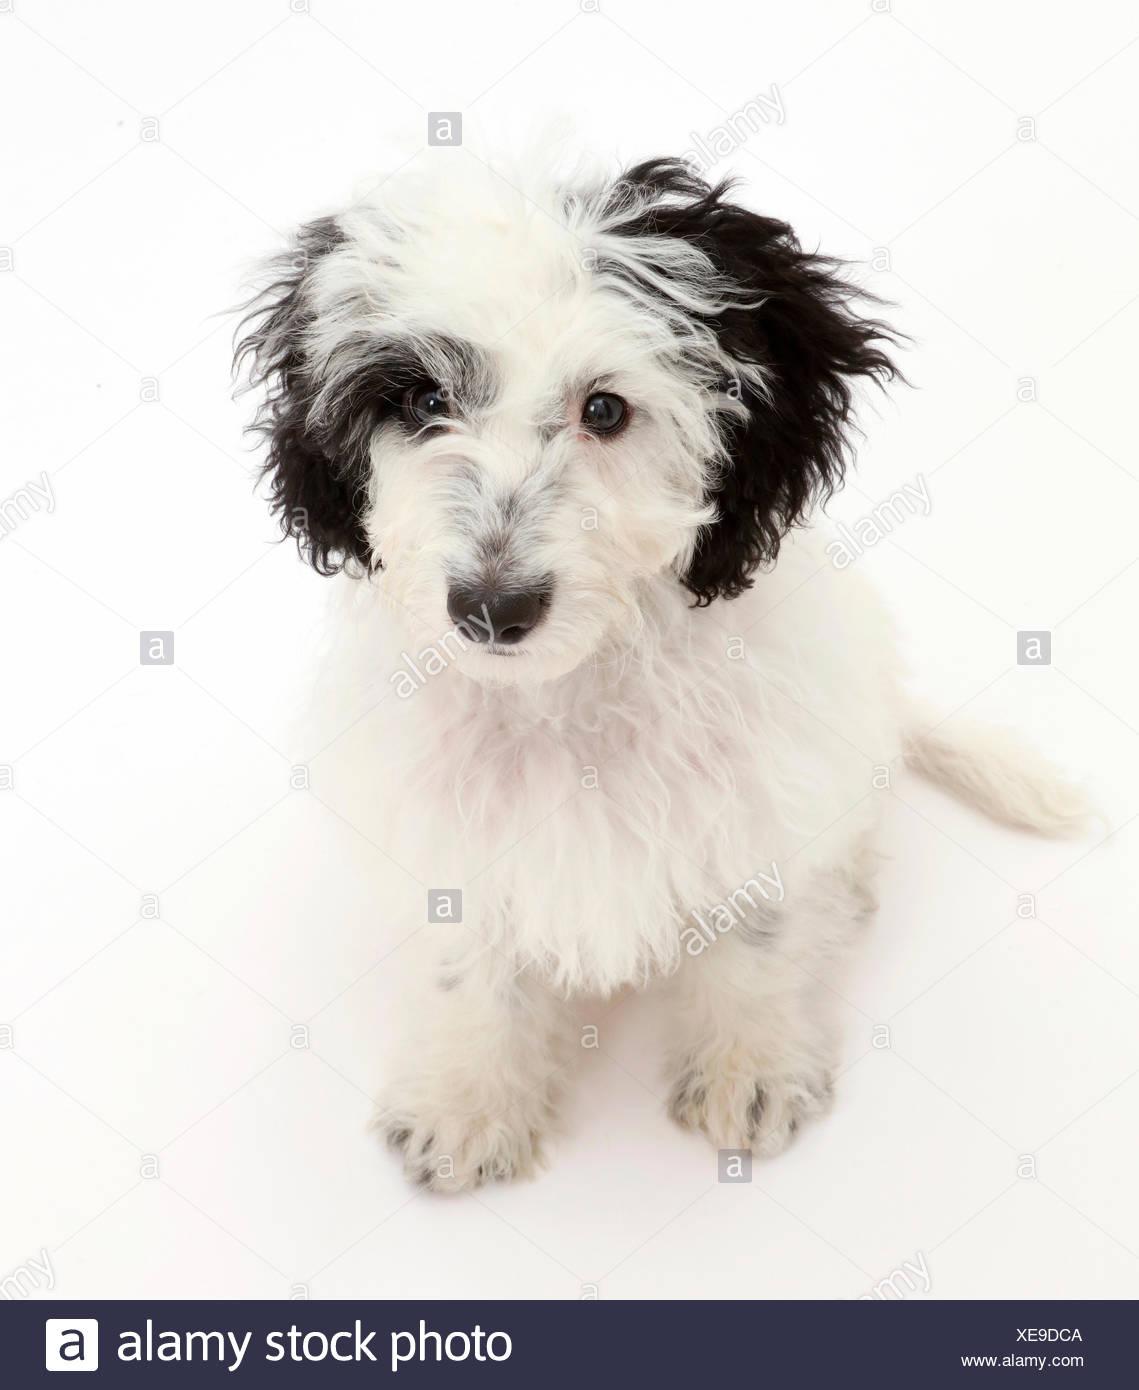 Black-and-white Cockapoo puppy. - Stock Image